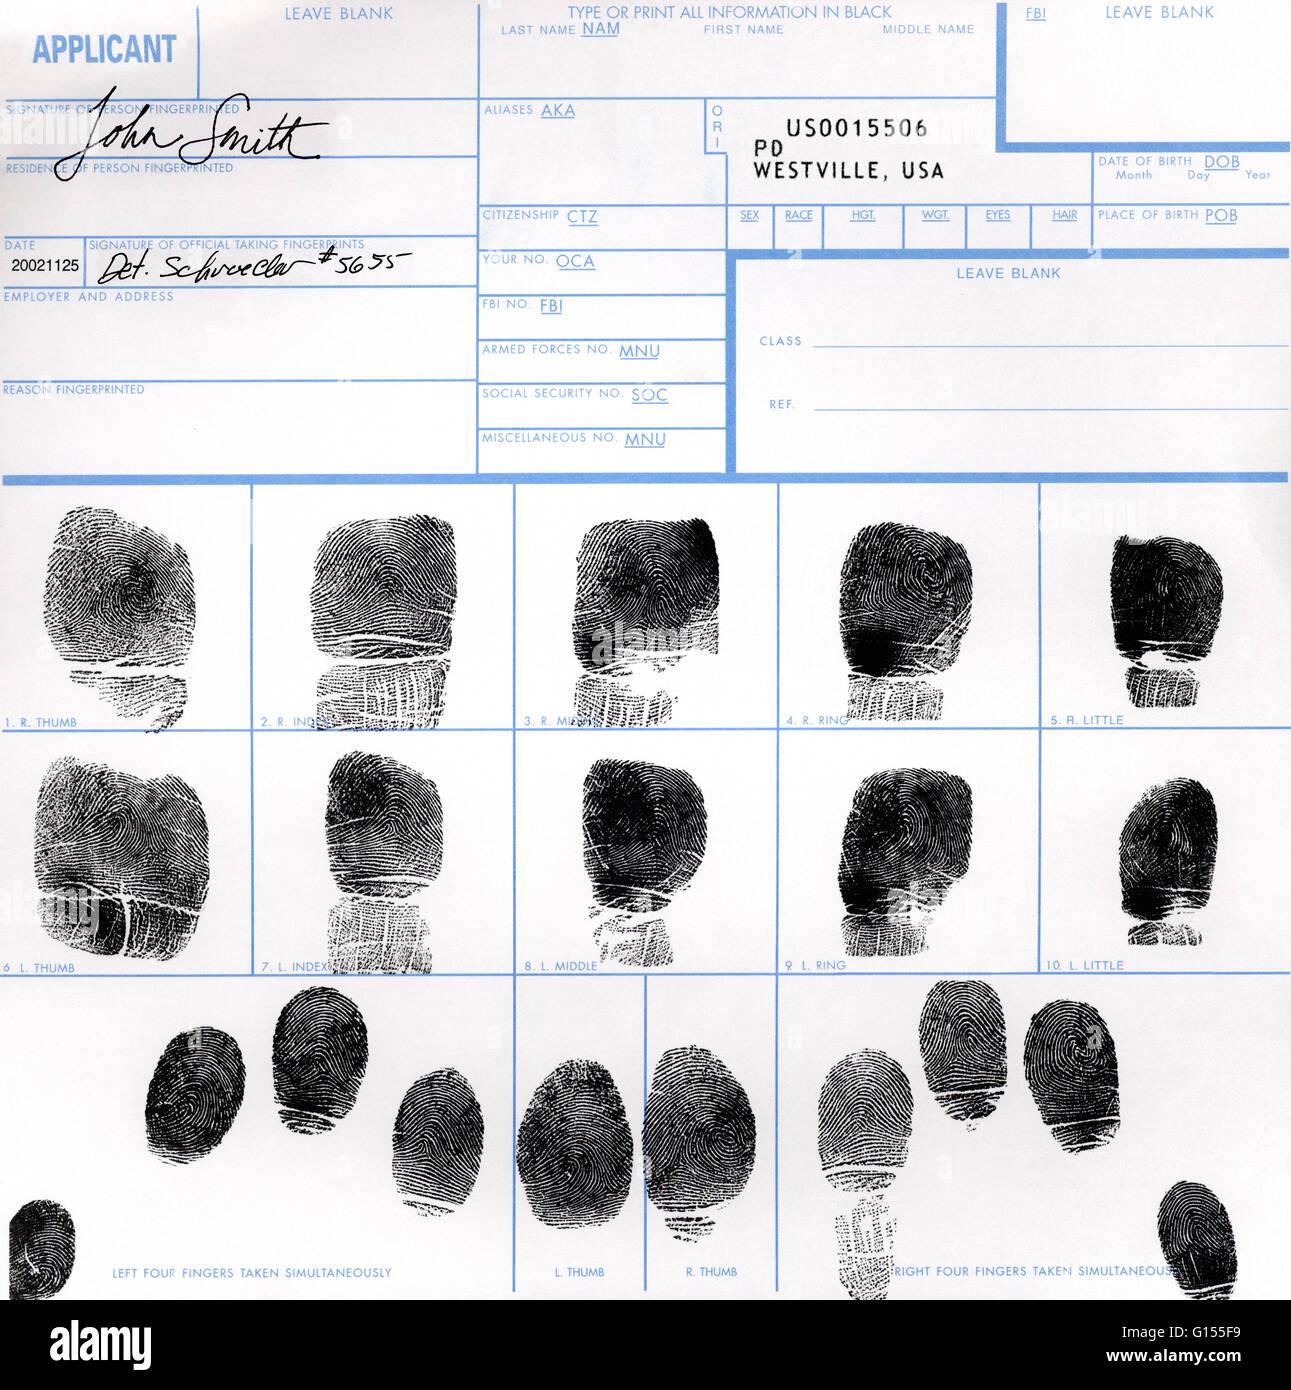 An Fbi Form Completed With All Ten Fingerprints Fingerprint Stock